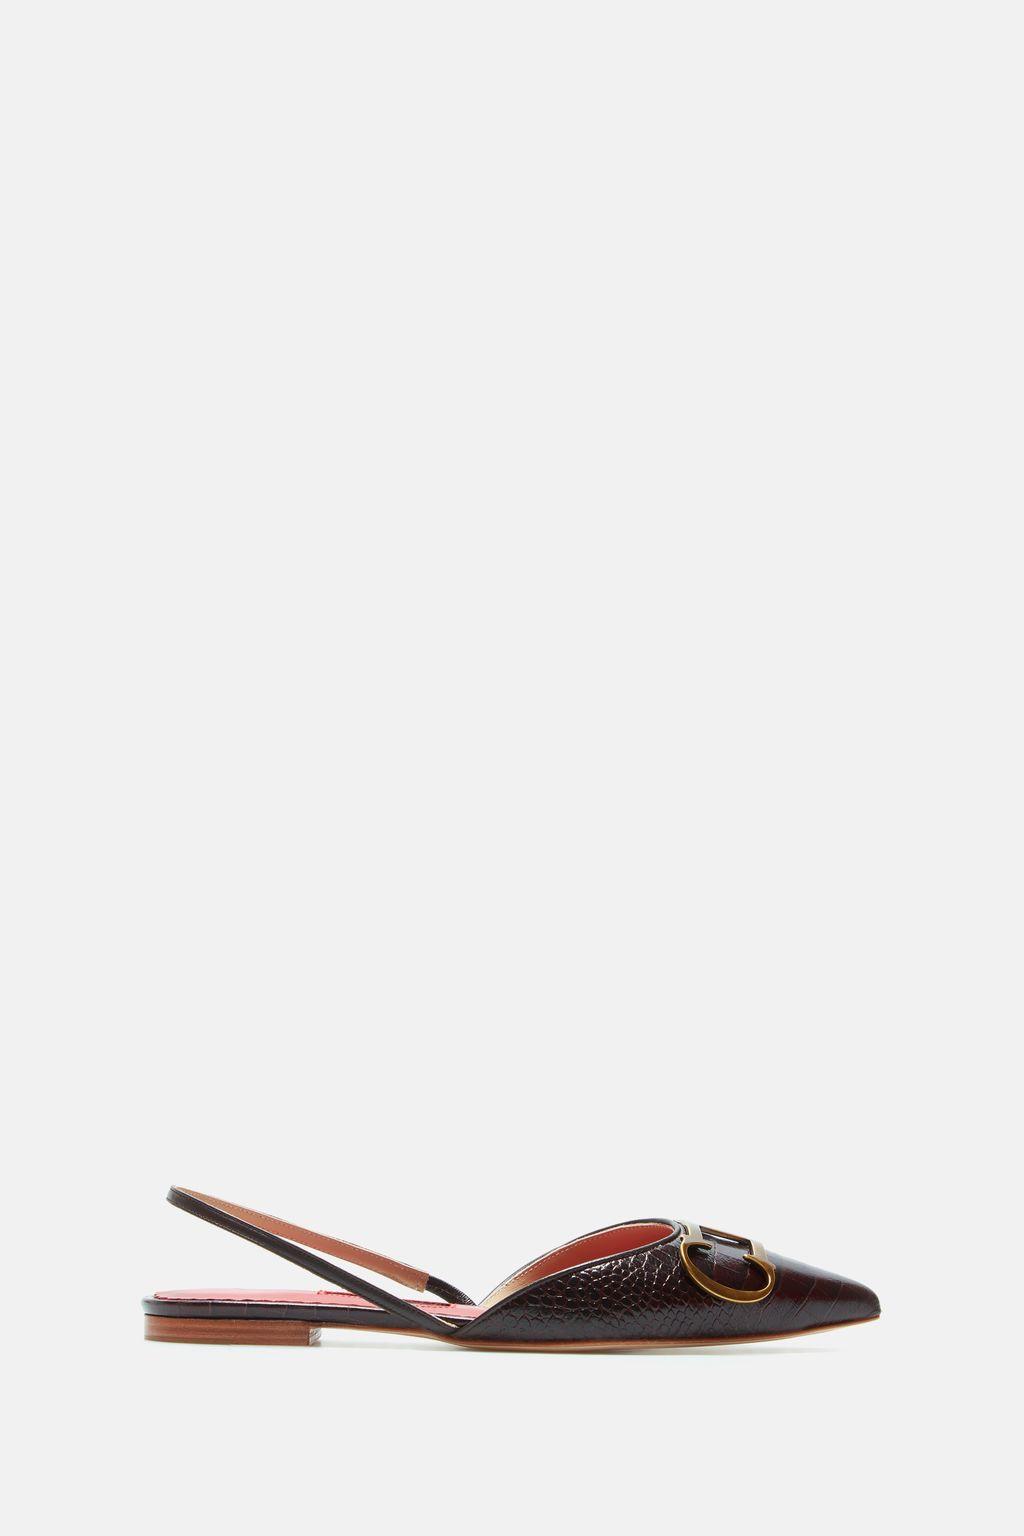 Initials Insignia croc-effect slingback flats